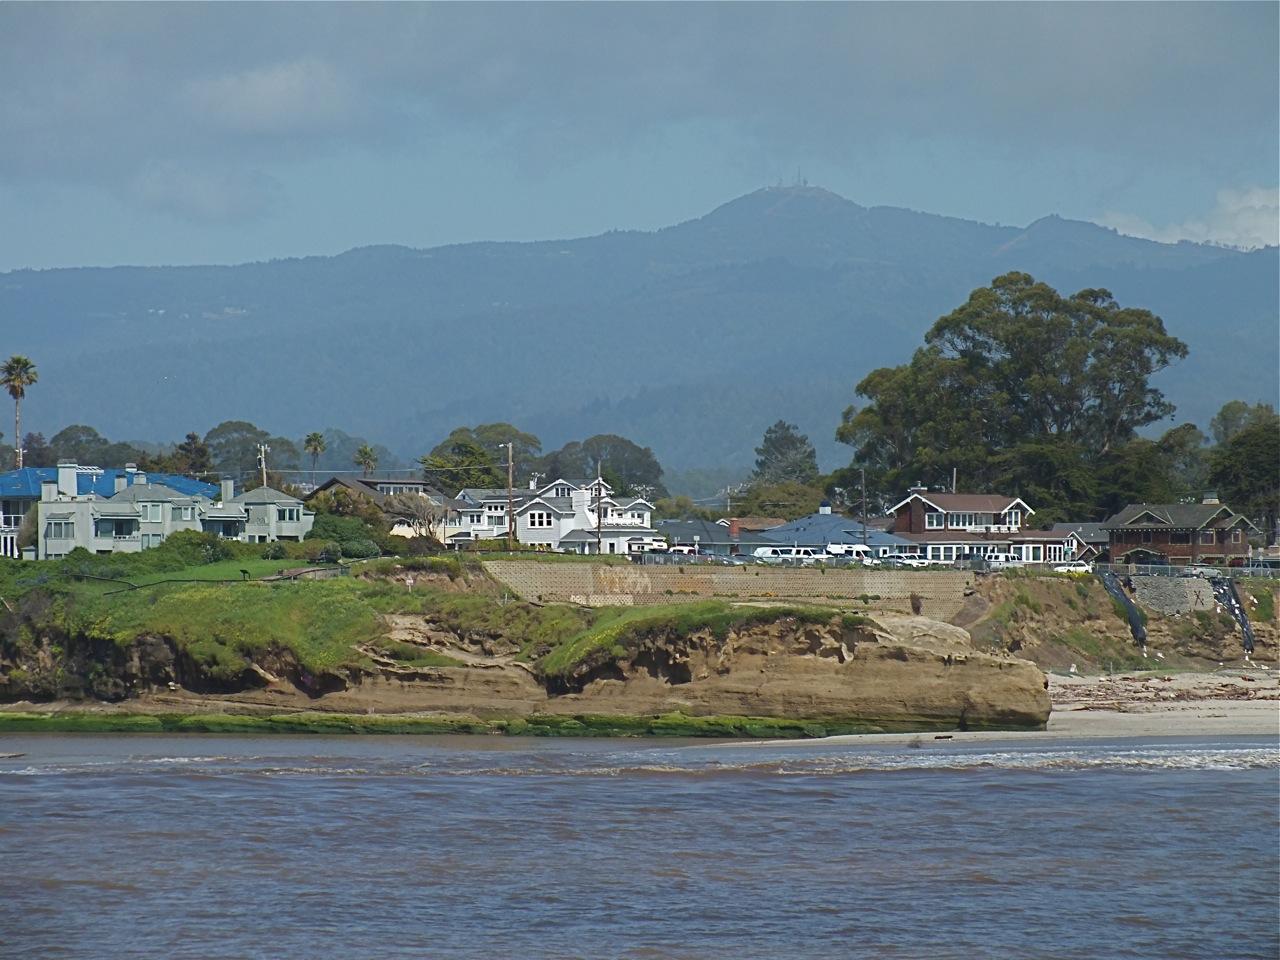 Loma Prieta from San Lorenzo River Point, Santa Cruz